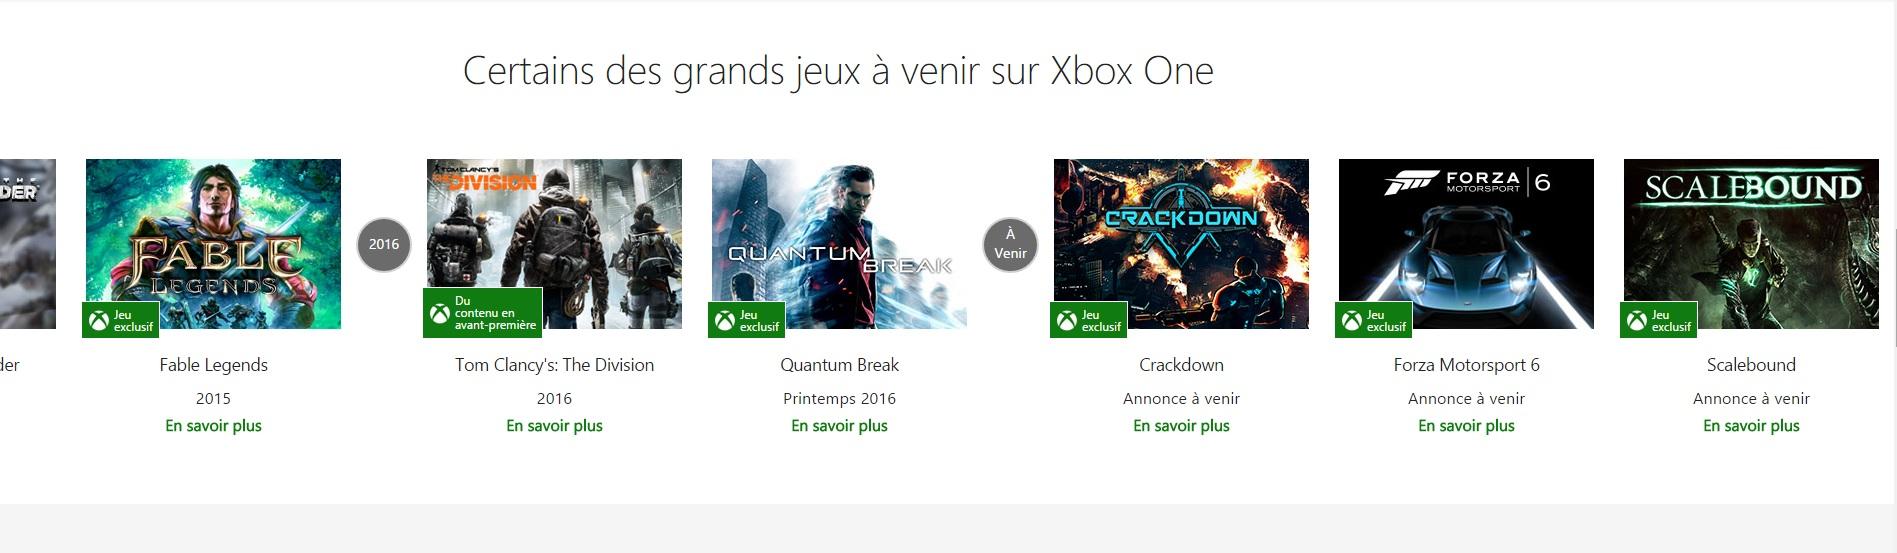 Sorties Xbox One